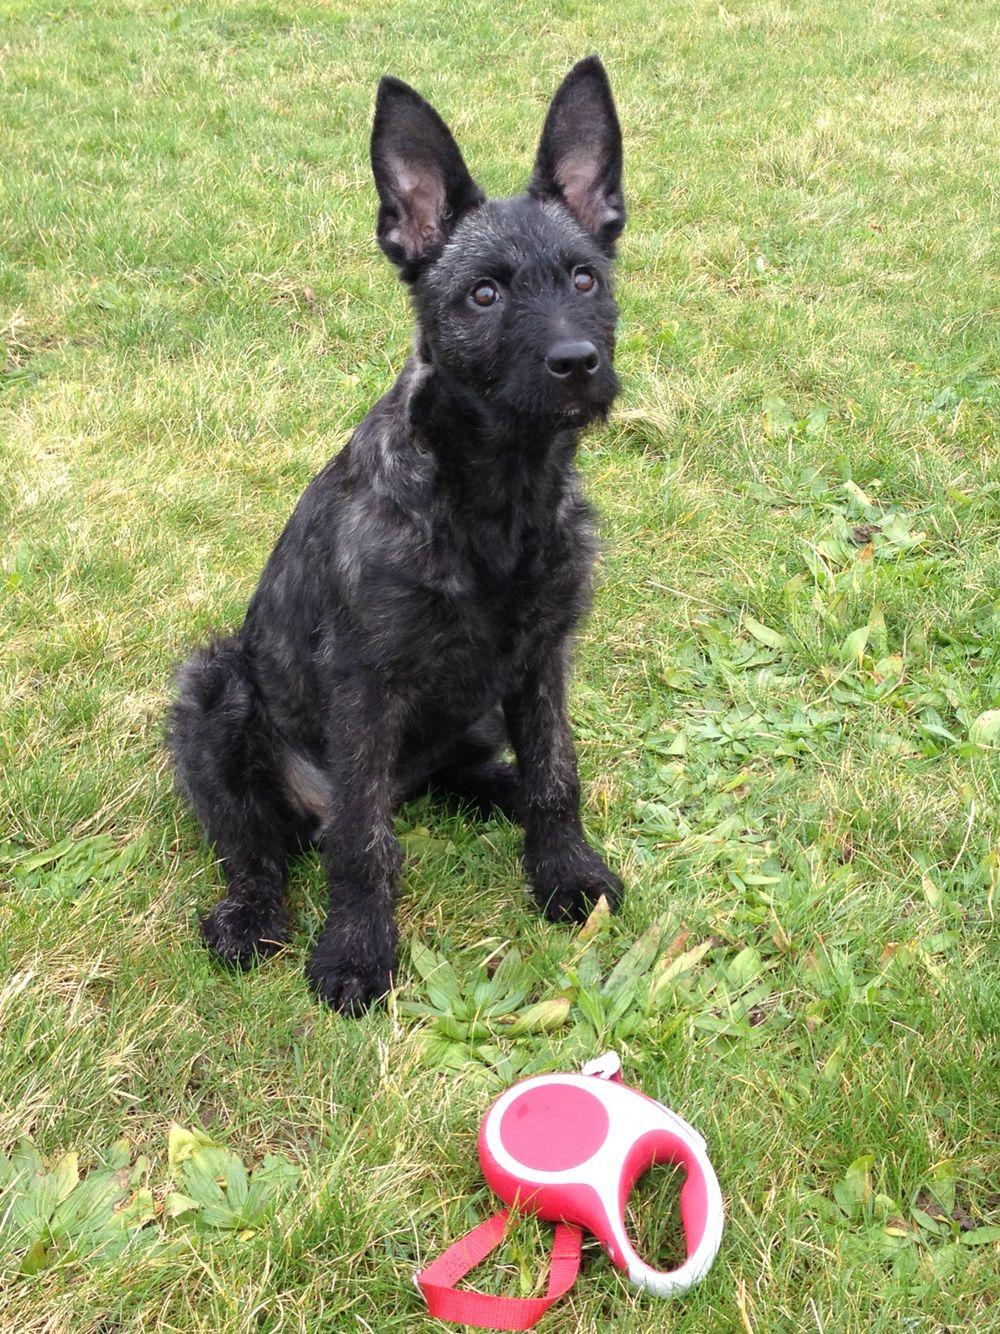 Dutch Shepherd Rough Haired 3 Months Old Kira Van Brabandstad Guard Dogs Dogs Shepherd